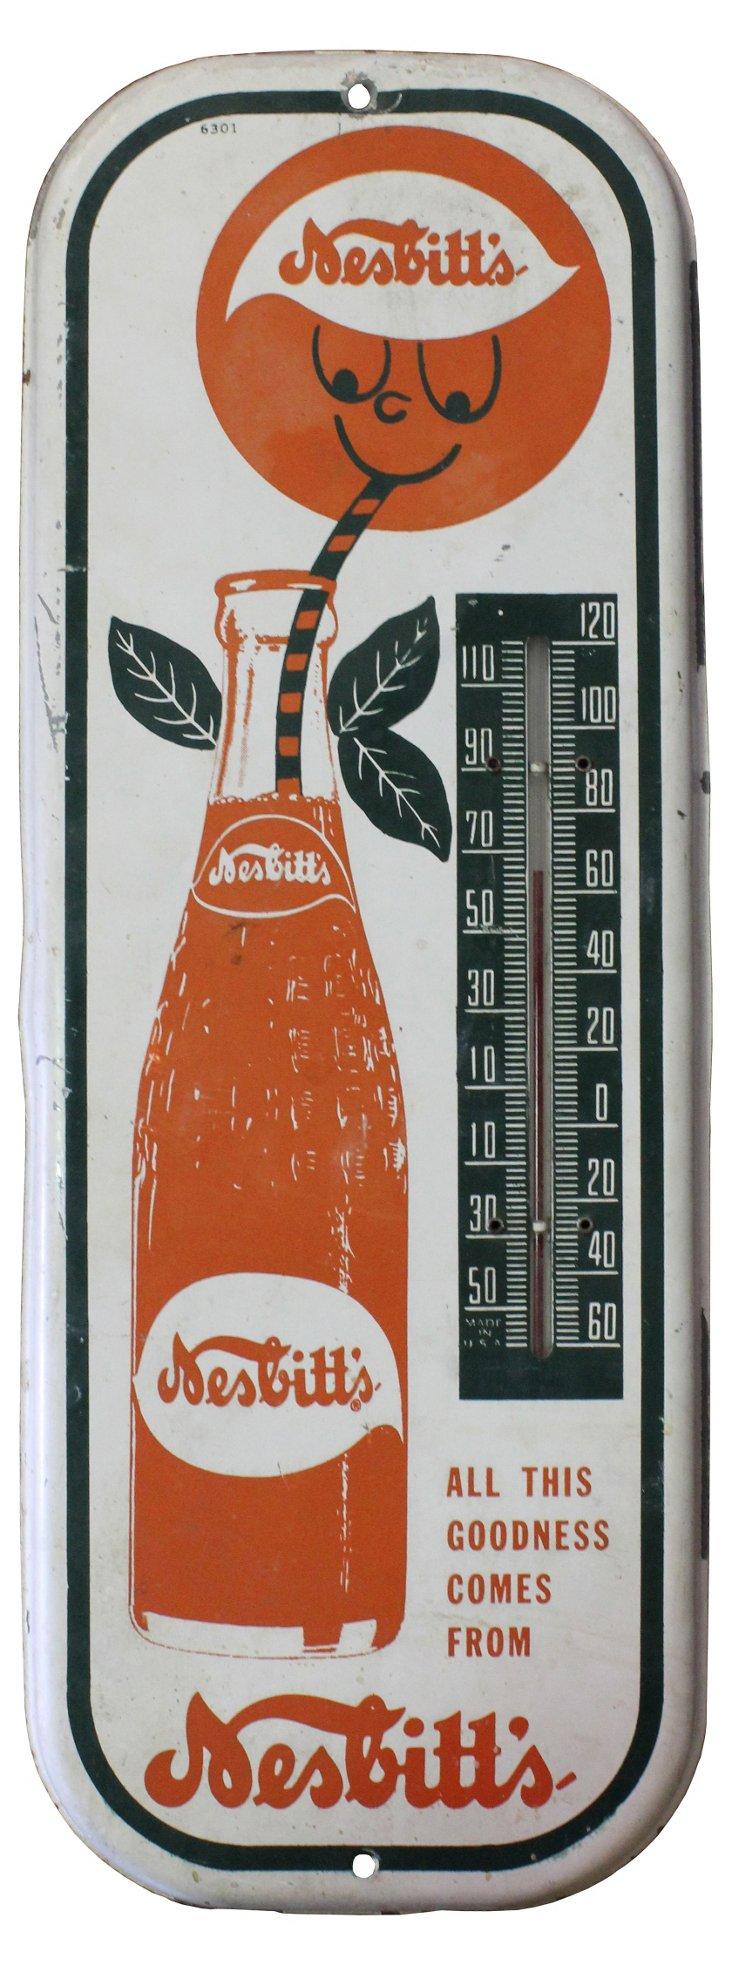 Nesbitt Soda Advertising Thermometer